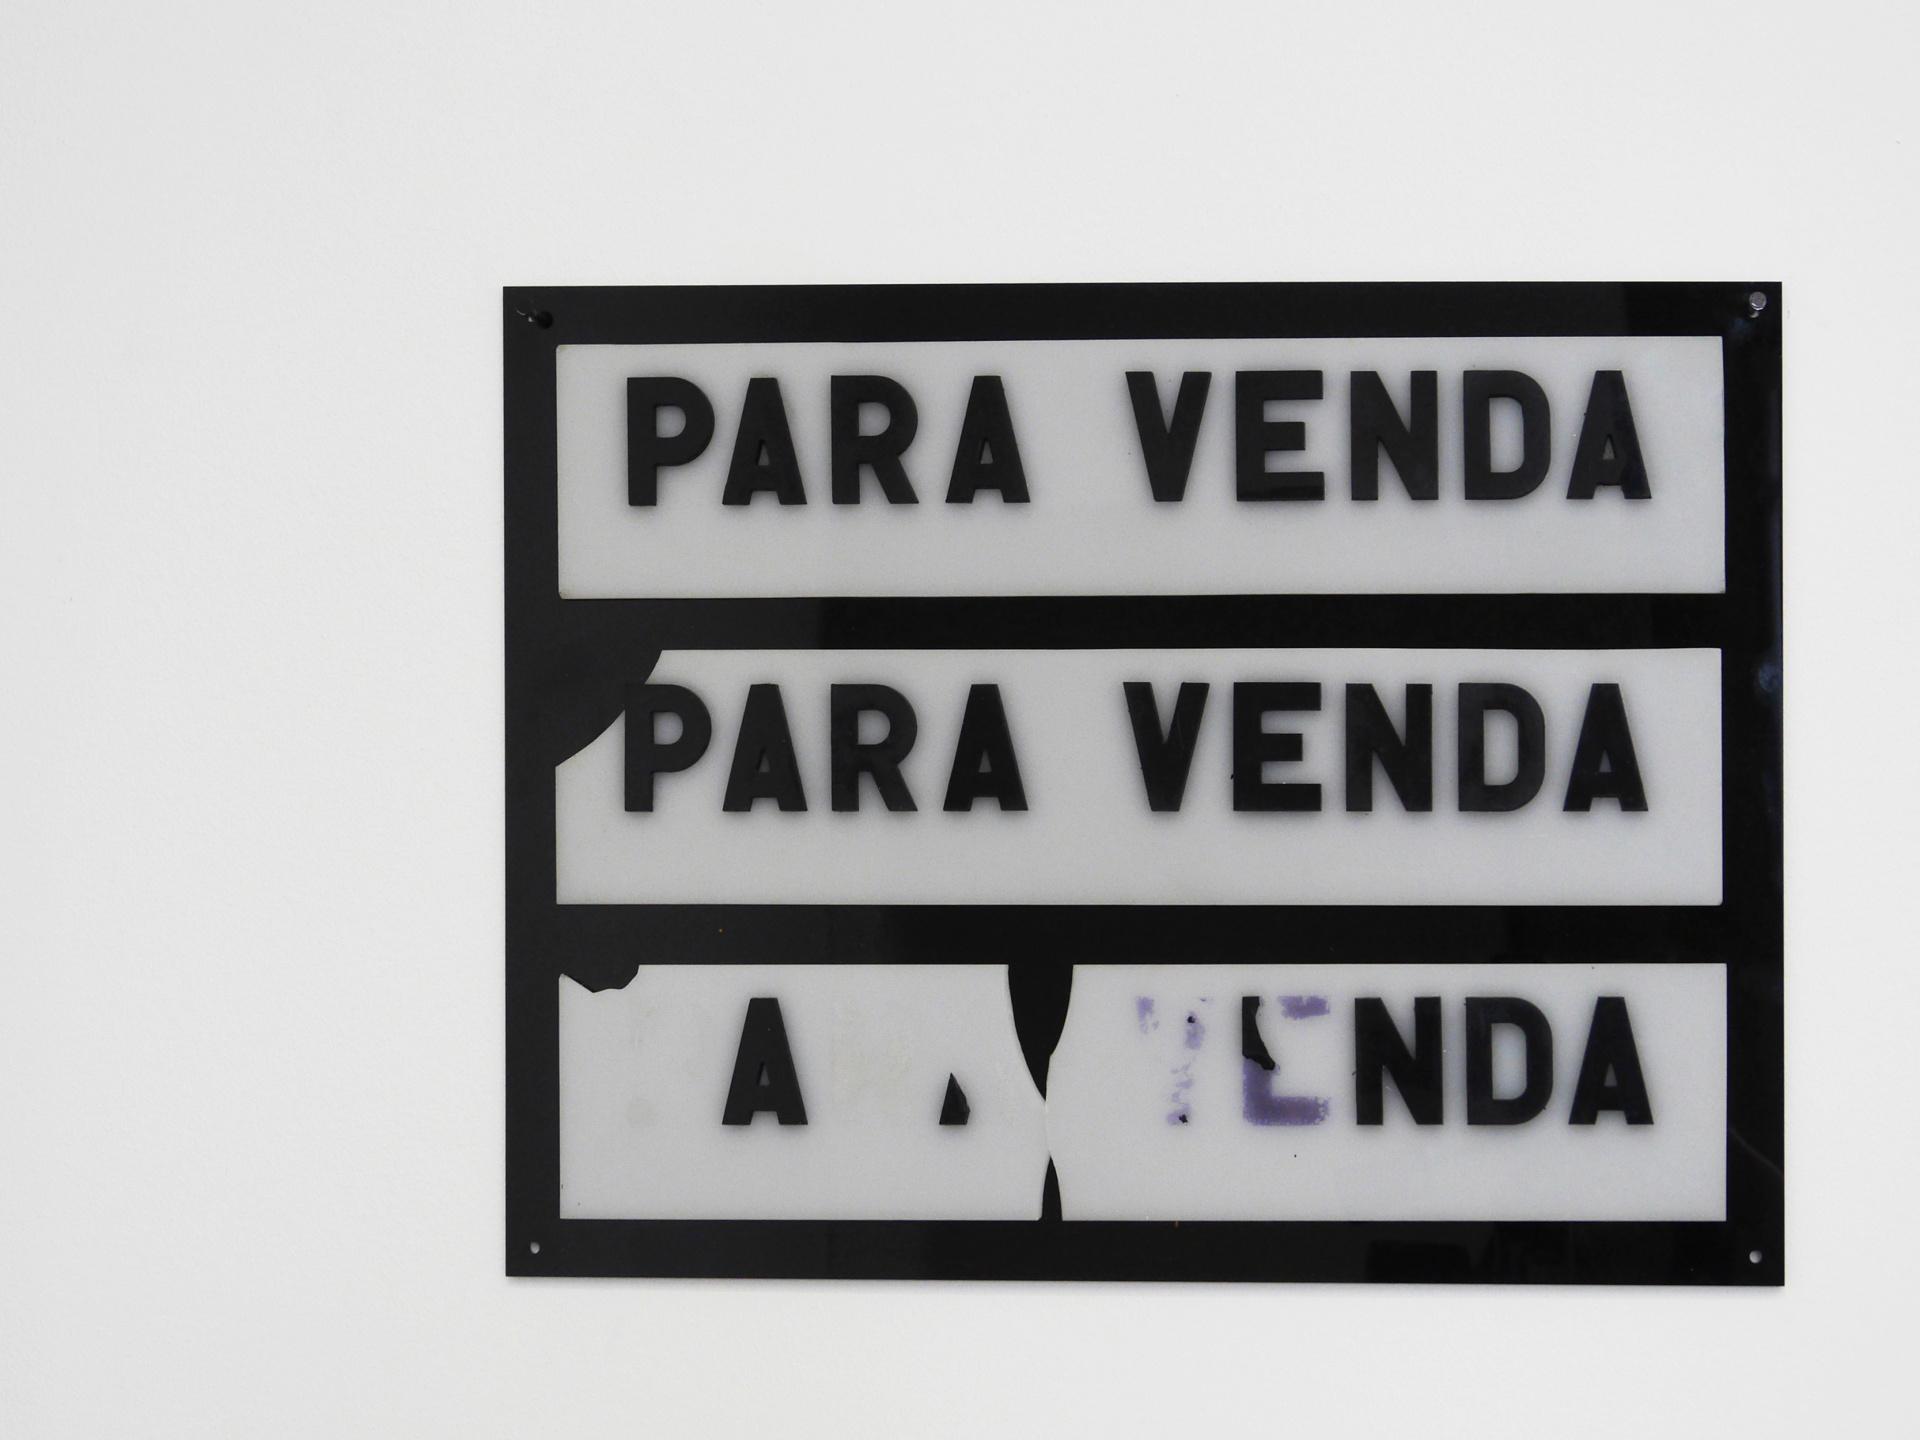 Post Ford Palace. Metacrilato (3 carteles recuperados del Palàcio Ford de Oporto). 33'5x44 cm. 2018